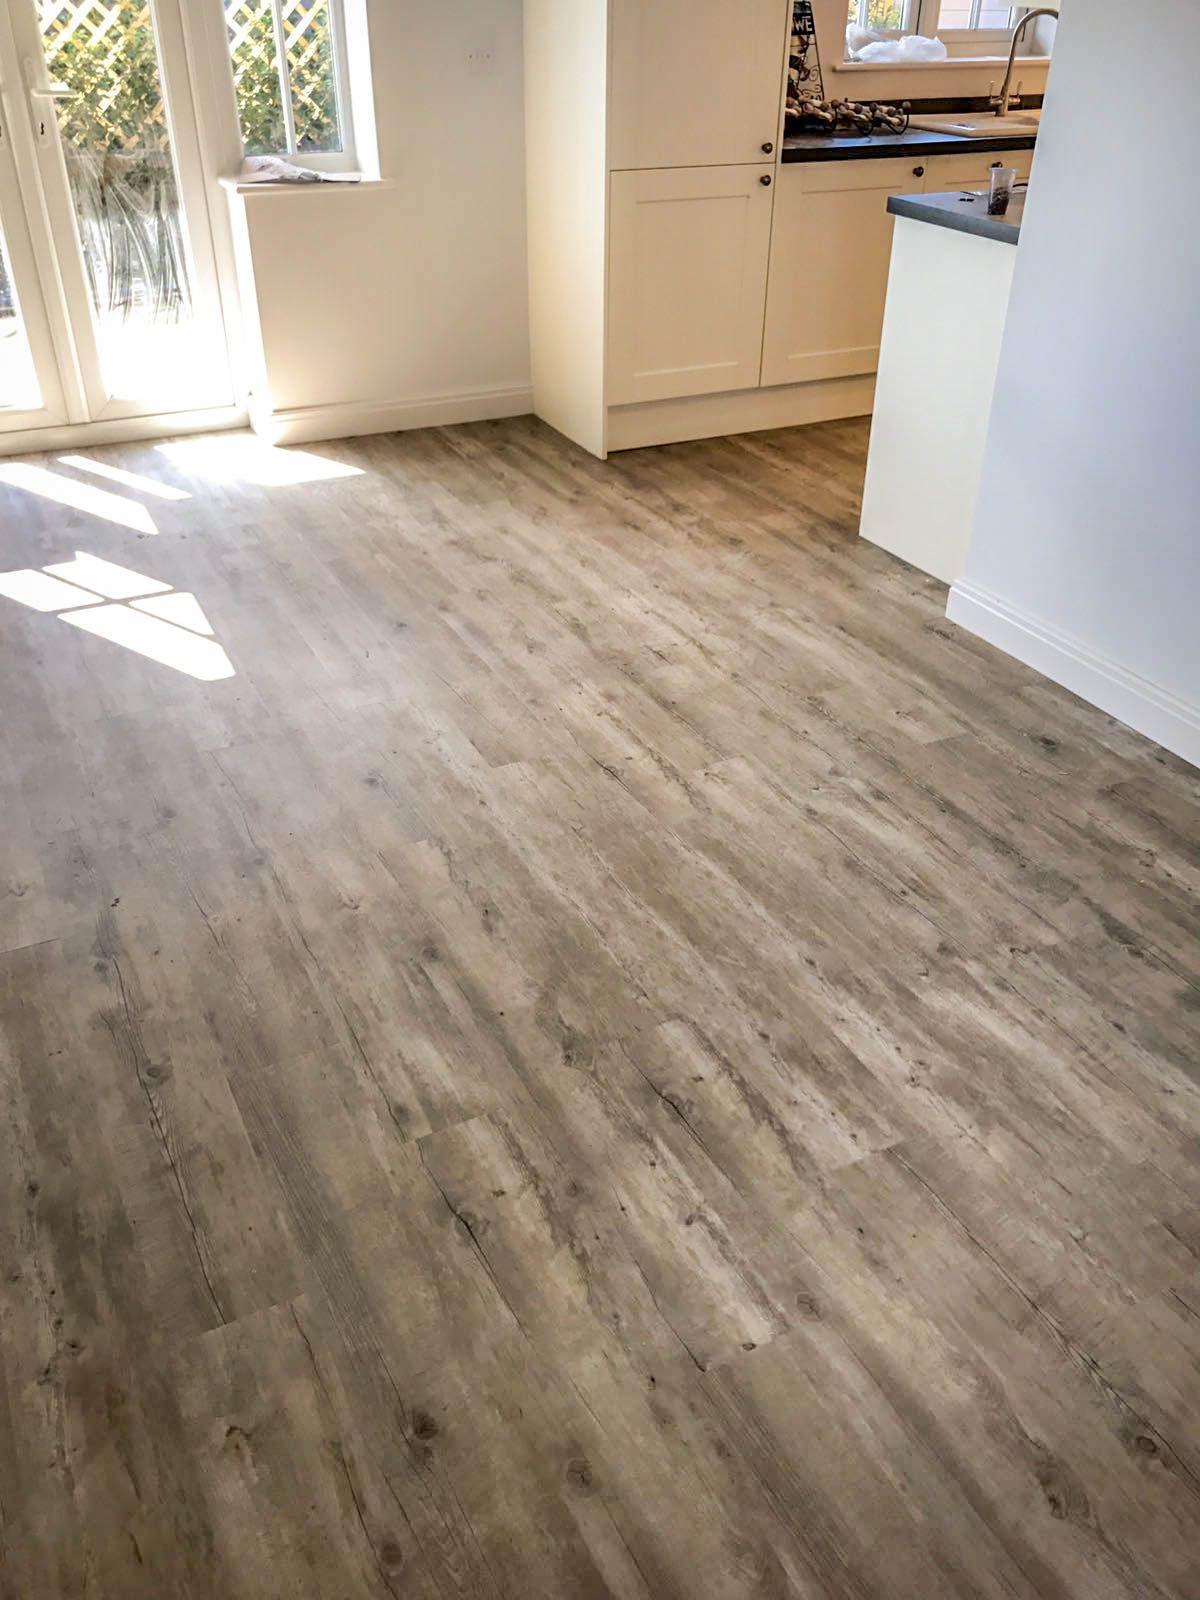 Living Room and Kitchen using Karndean wood flooring Van